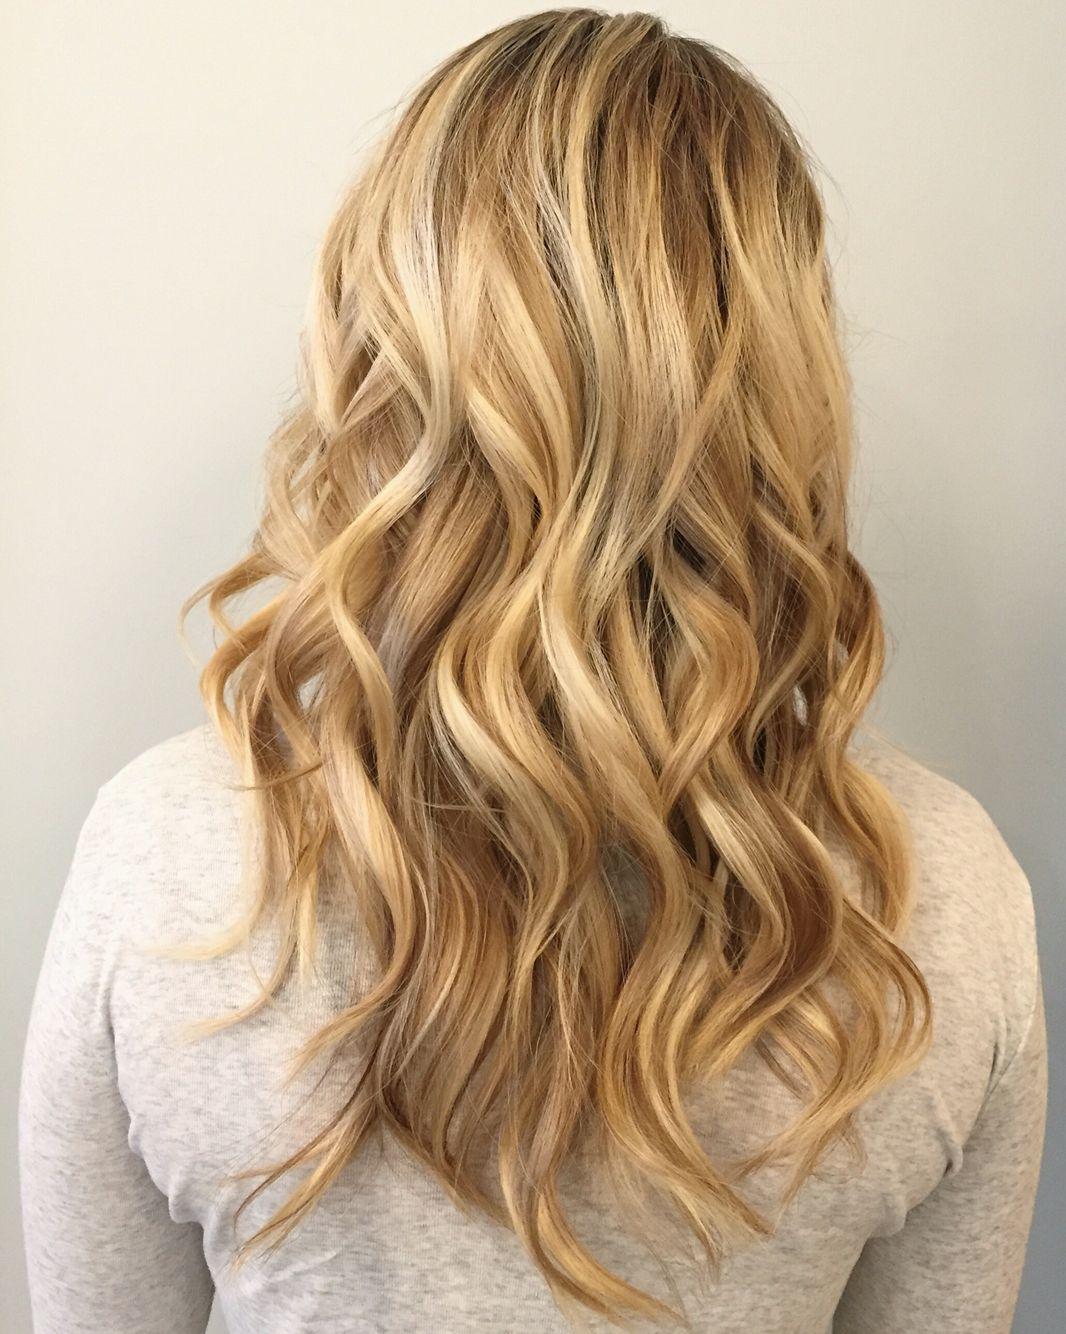 By Hollylikeshair In Portland Or At Blueprint Modern Hair Long Hair Beach Waves Balayage Blonde Highlights Modern Hairstyles Hair Styles Hair